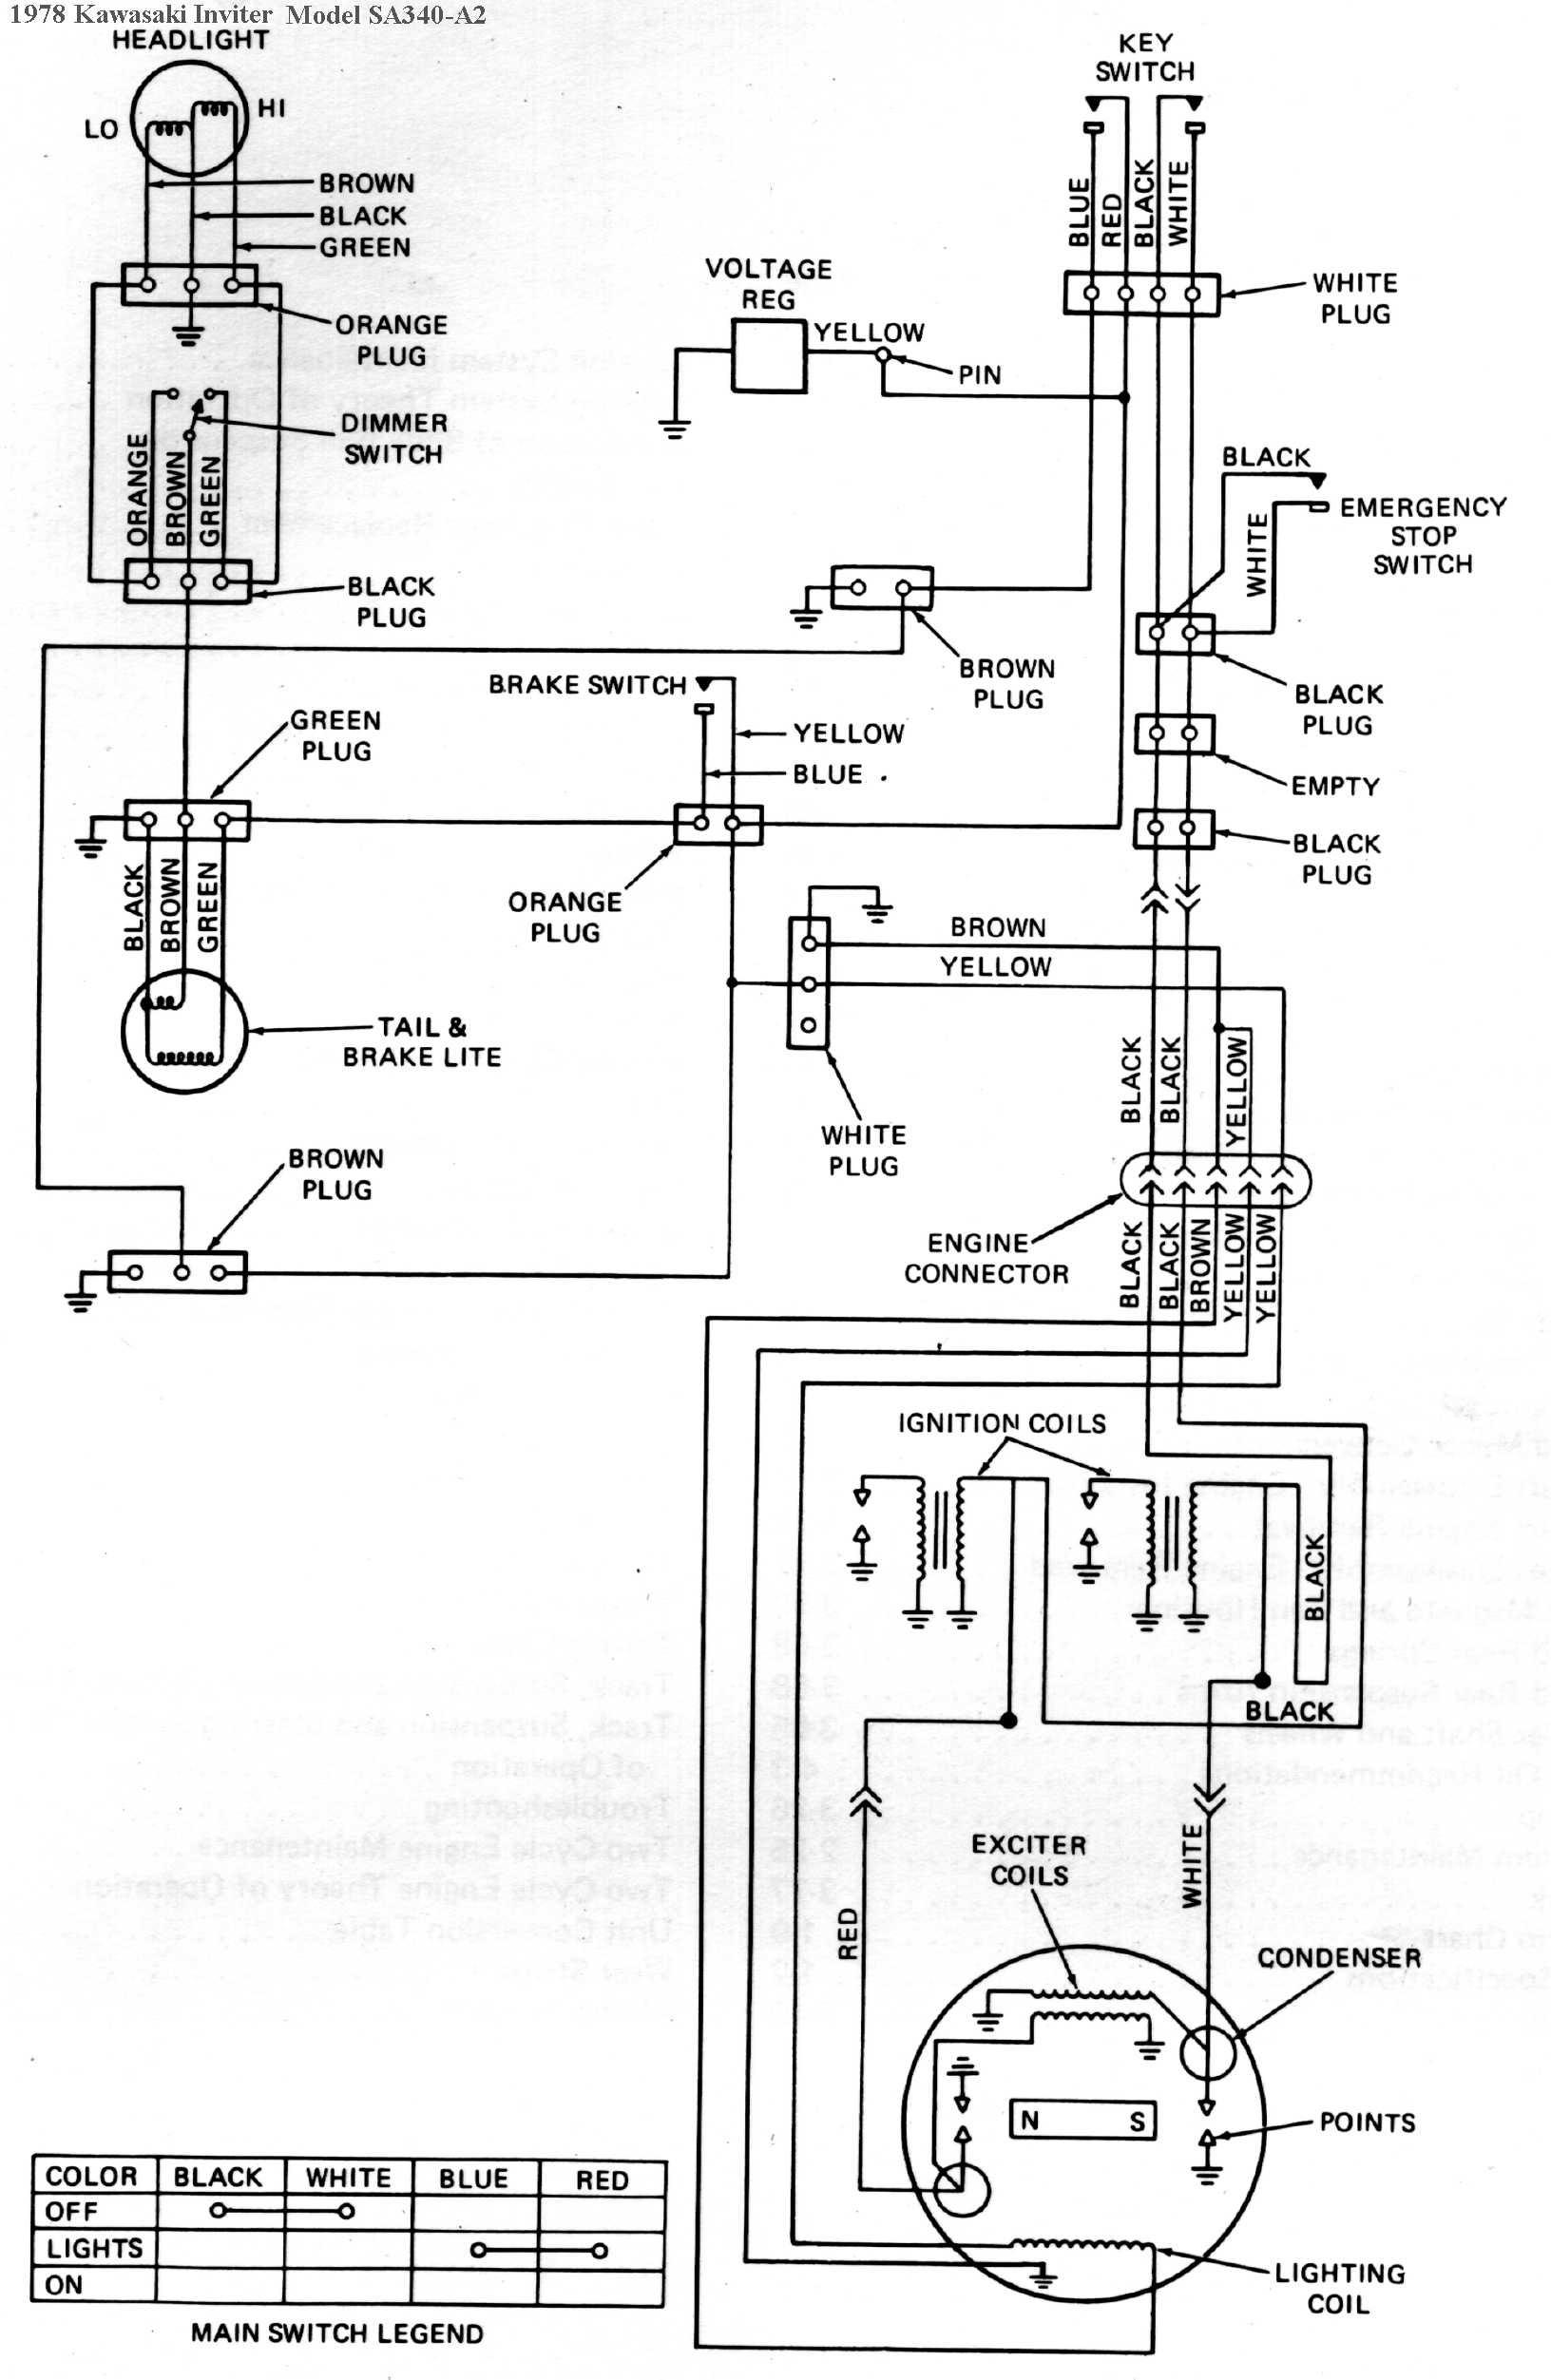 Diagram Dodge 440 Spark Plug Wiring Diagram Full Version Hd Quality Wiring Diagram Militarywirings Efran It